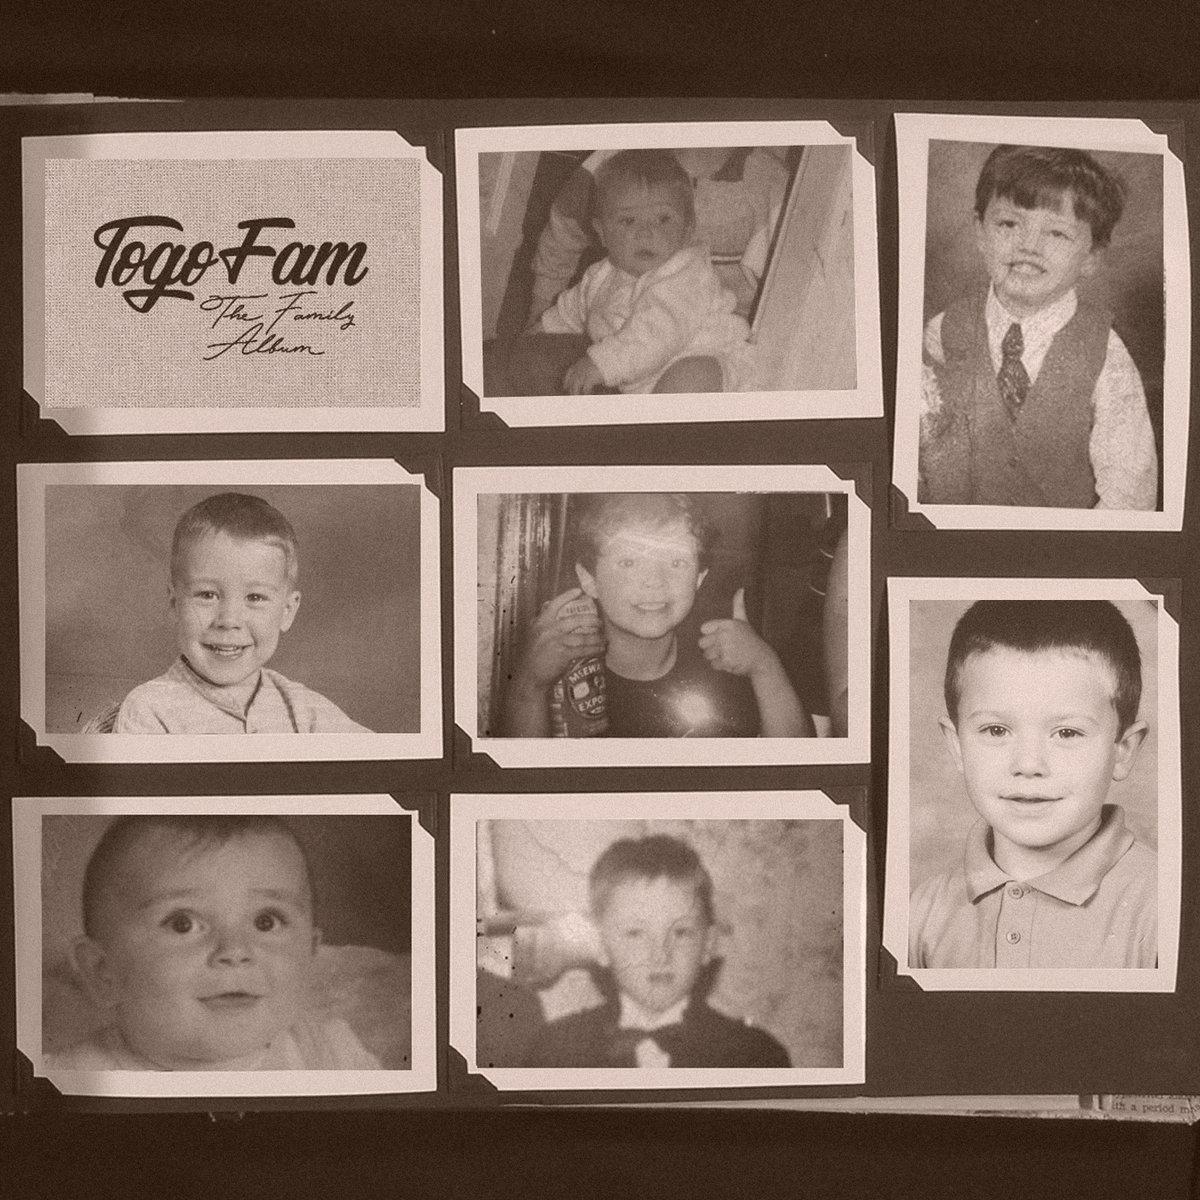 togo fam the family album subfriction records